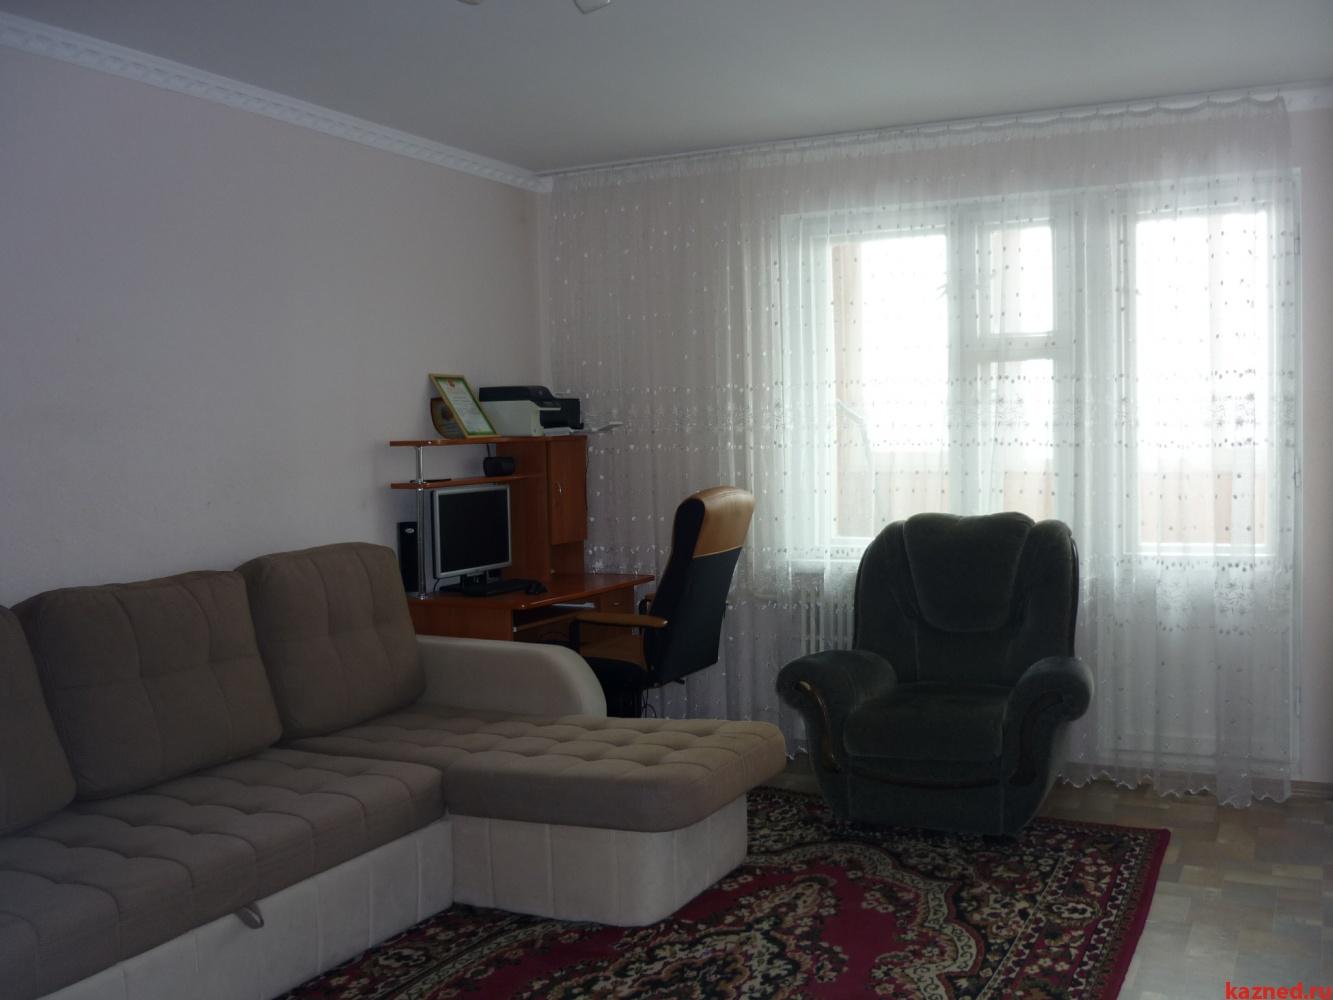 Продажа 1-к квартиры Фатыха Амирхана д.53б, 38 м² (миниатюра №1)